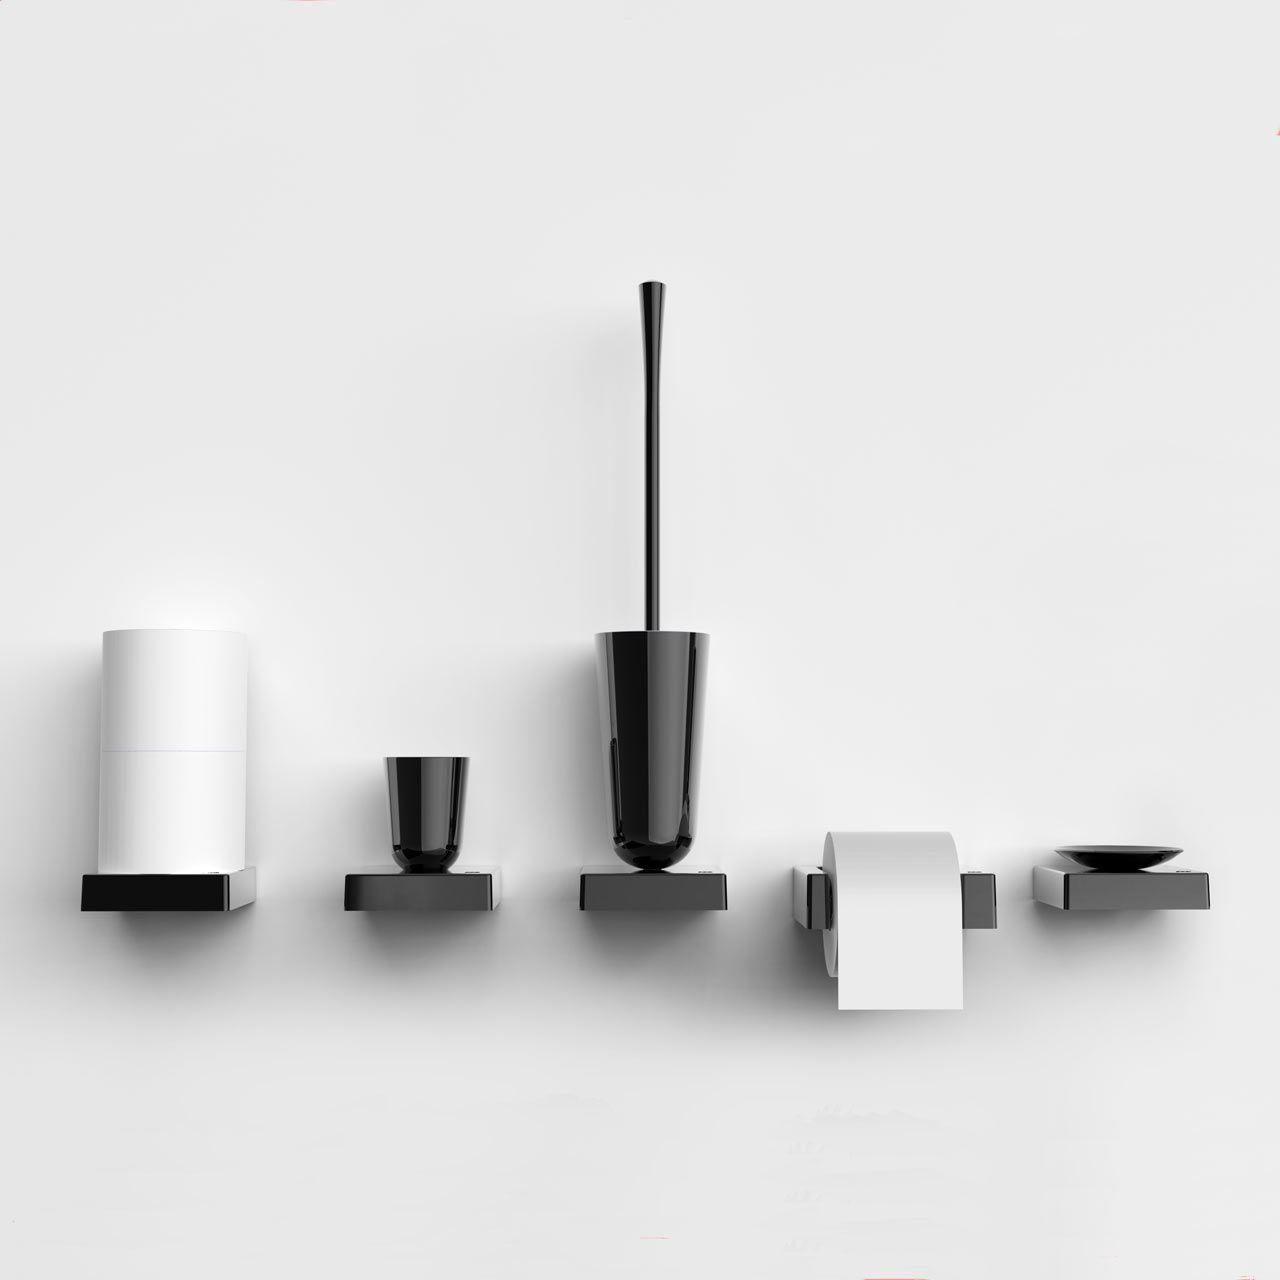 platform a line of bathroom accessories by brad ascalon for pba